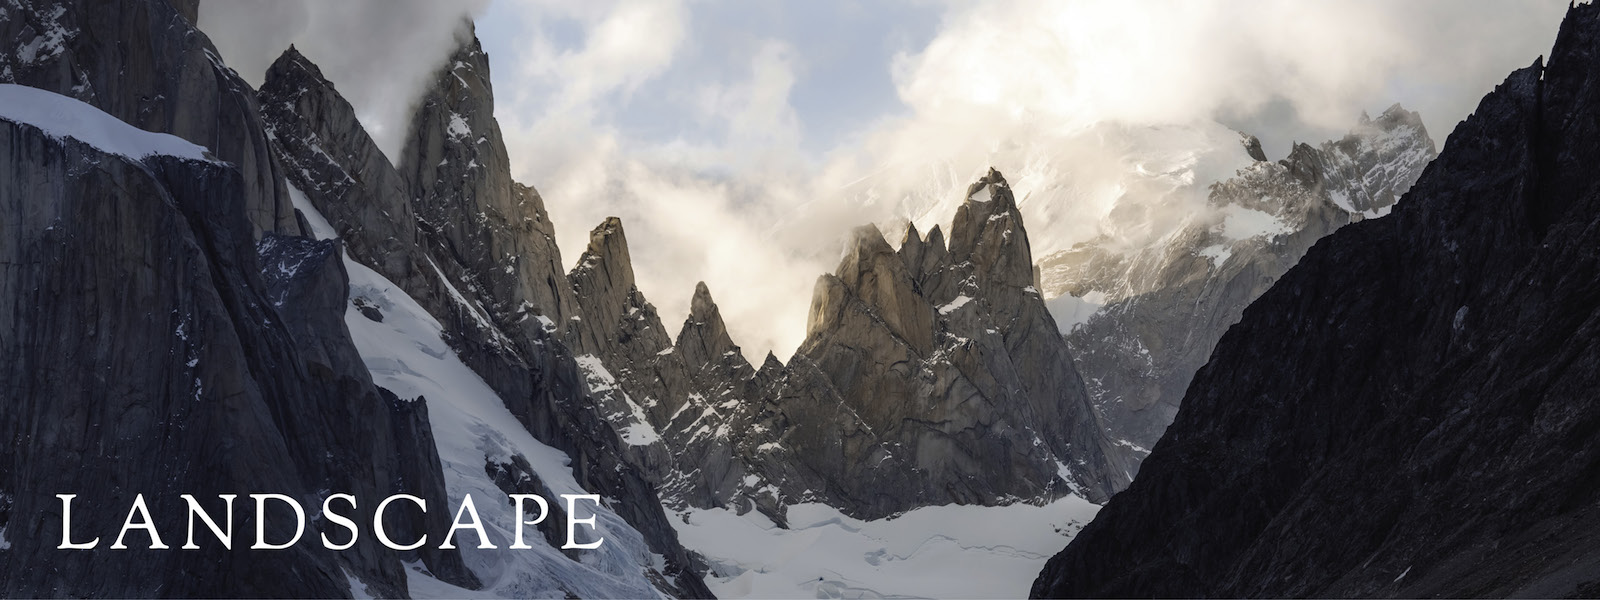 Landscape Banner.jpg